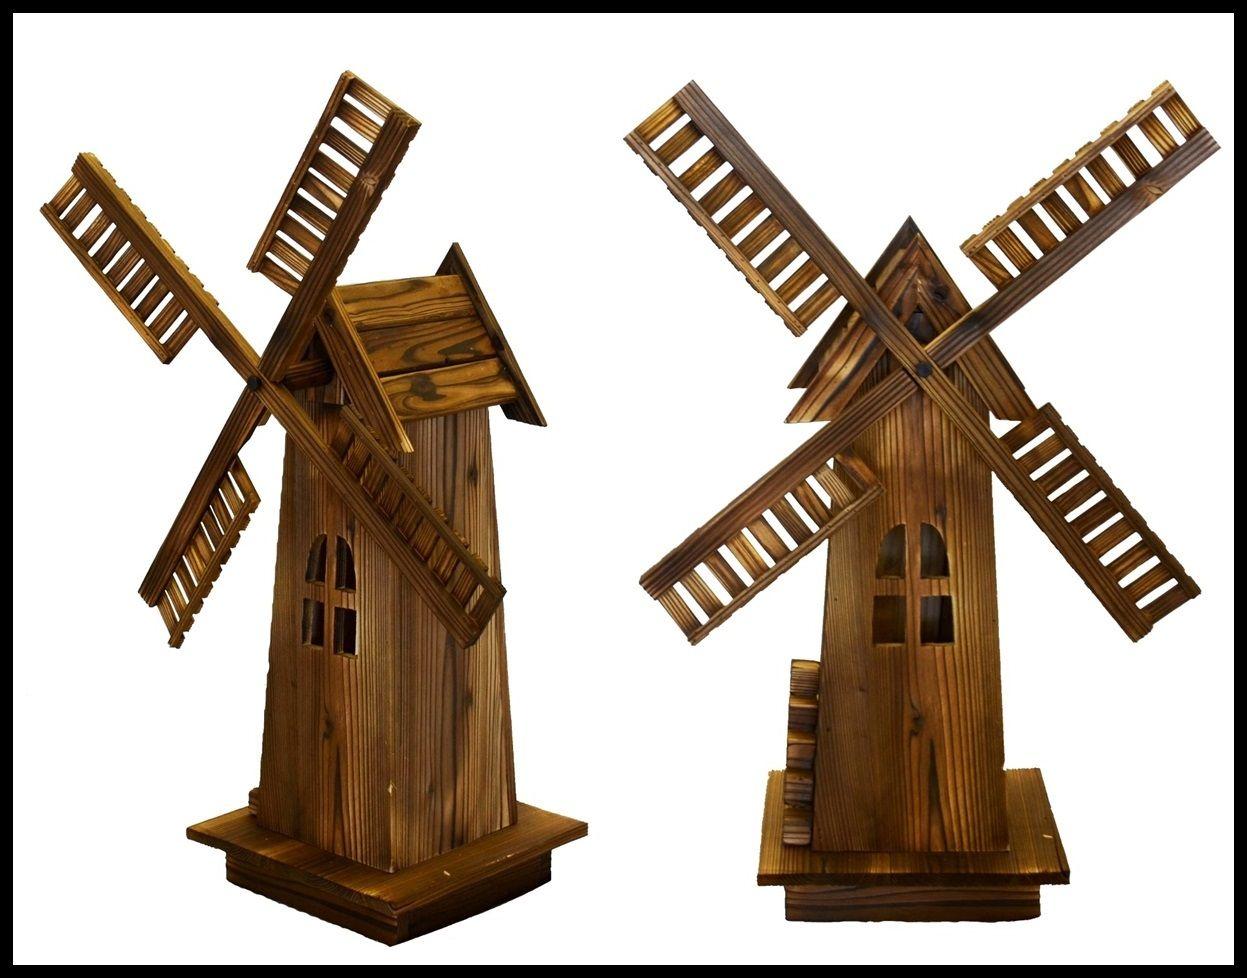 Wooden barrels 1 png by fumar porros on deviantart - Wooden Dutch Windmill